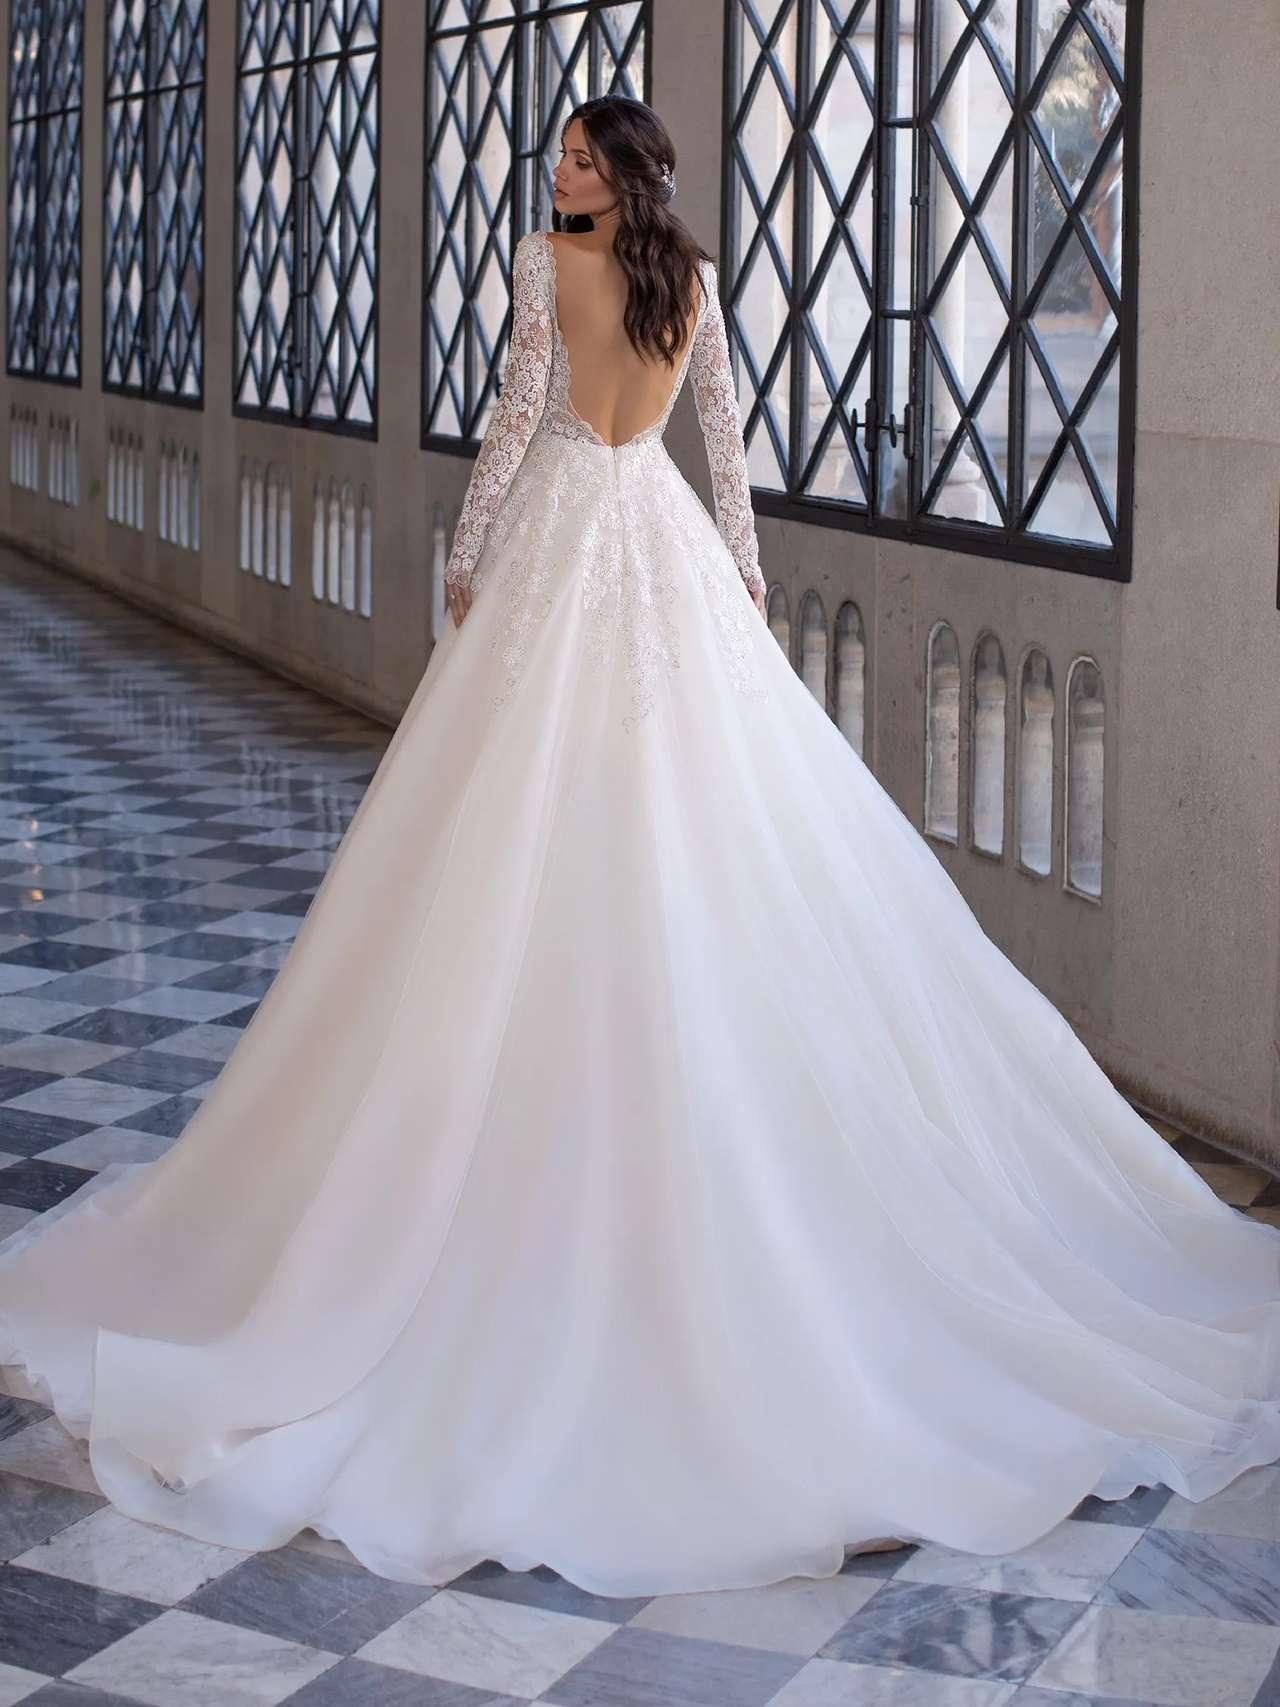 Pronovias 2021 menyasszonyi ruha: Landis